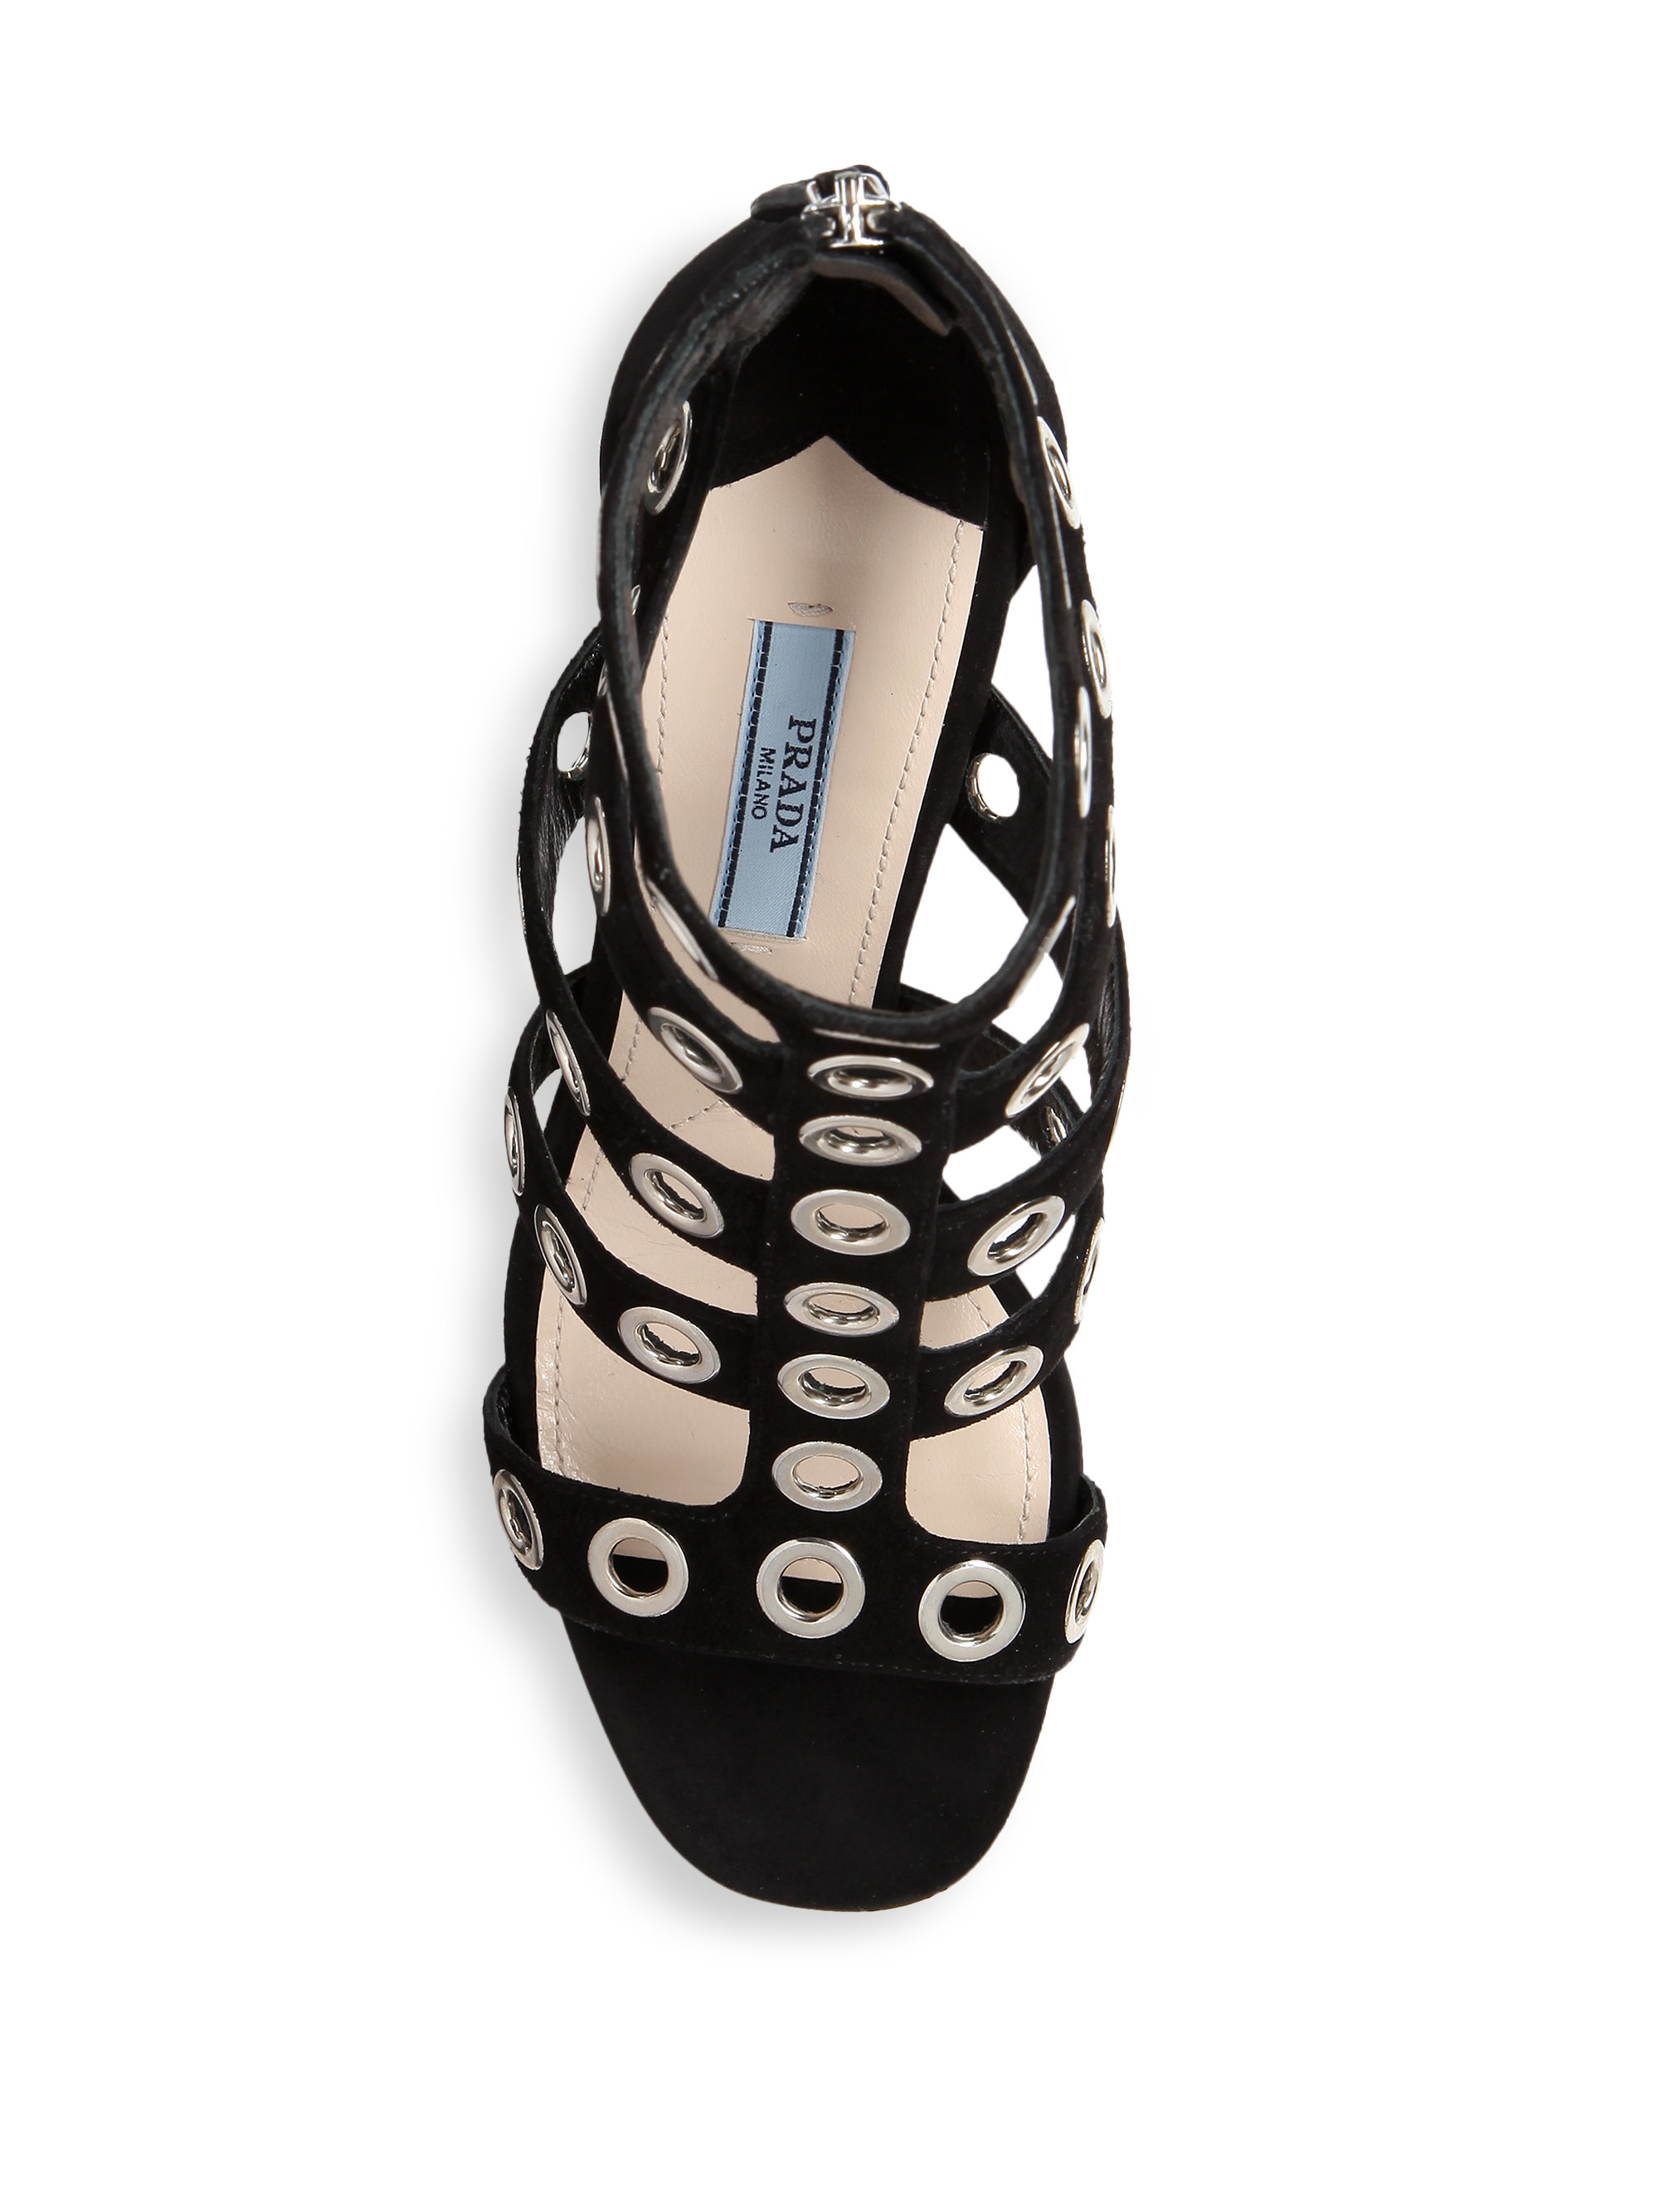 Prada Grommeted Suede Gladiator Sandals In Black Lyst